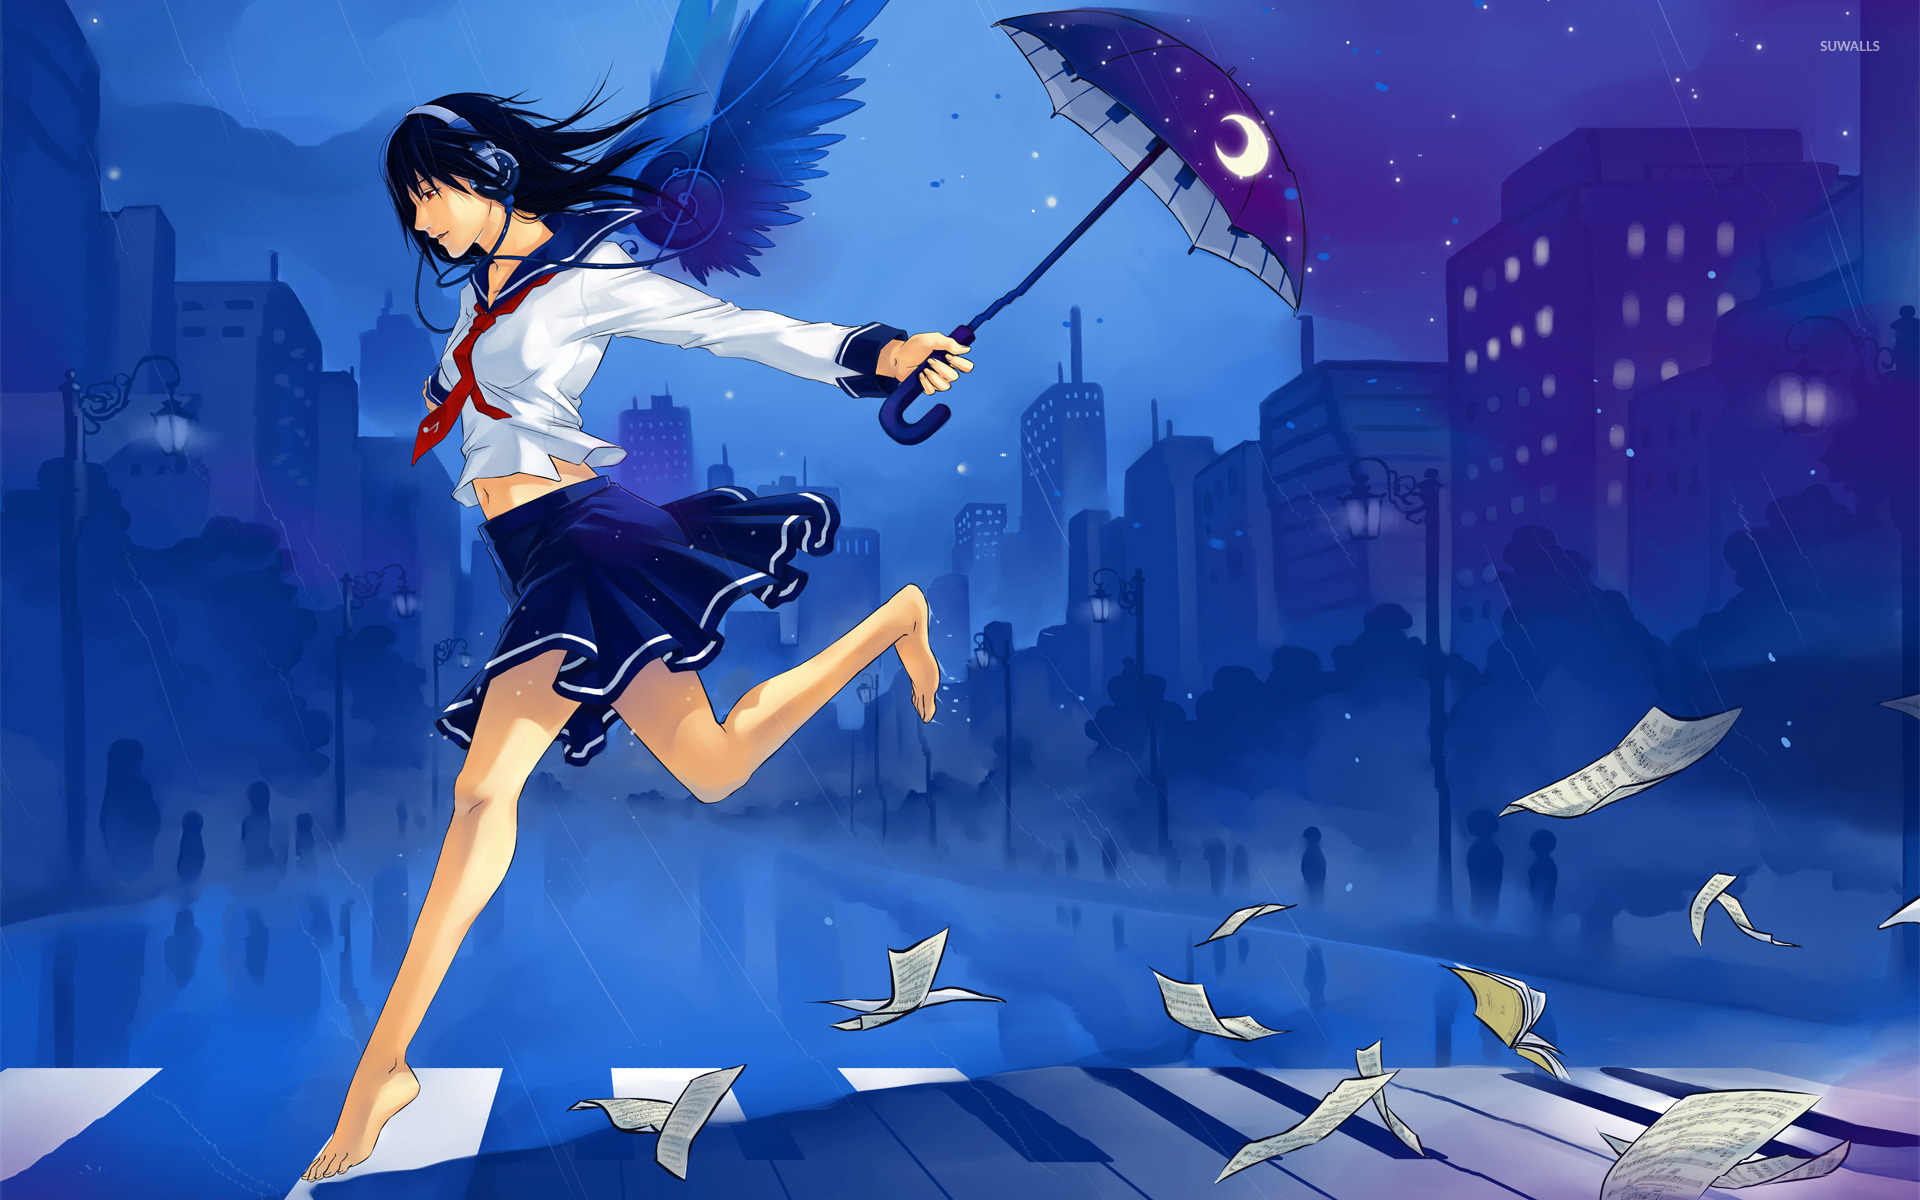 School Girl Running In The Rain Wallpaper Anime Wallpapers 42445